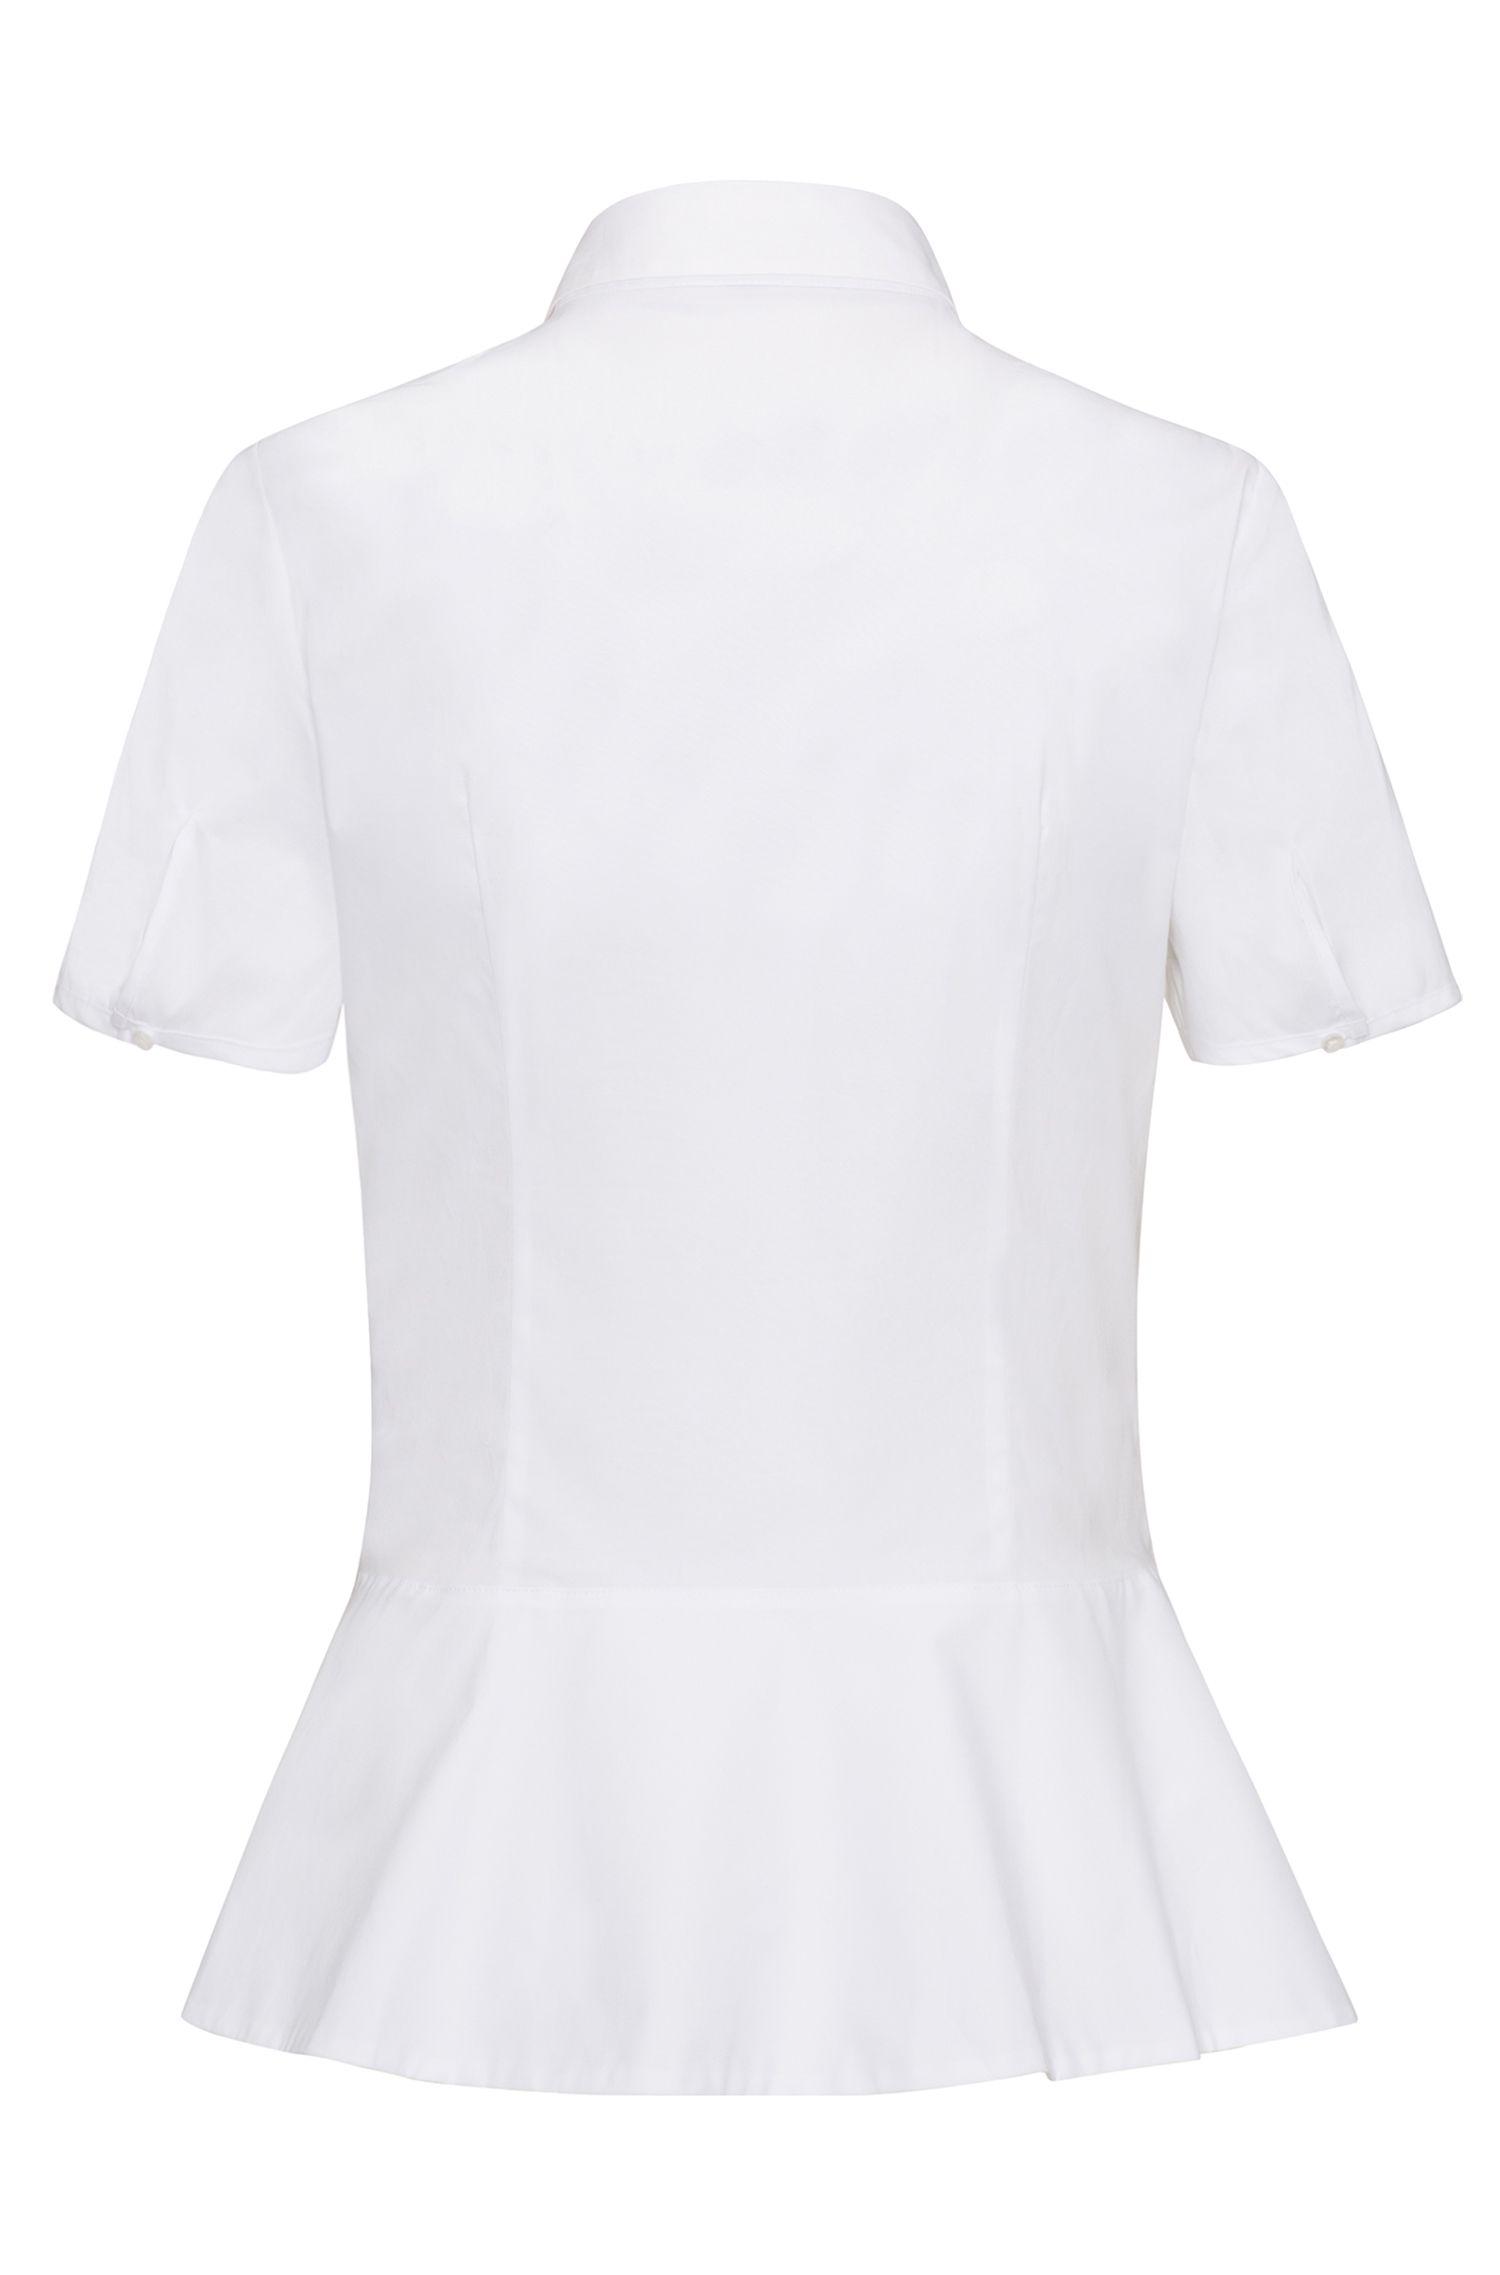 Stretch Cotton Blouse | Enilai